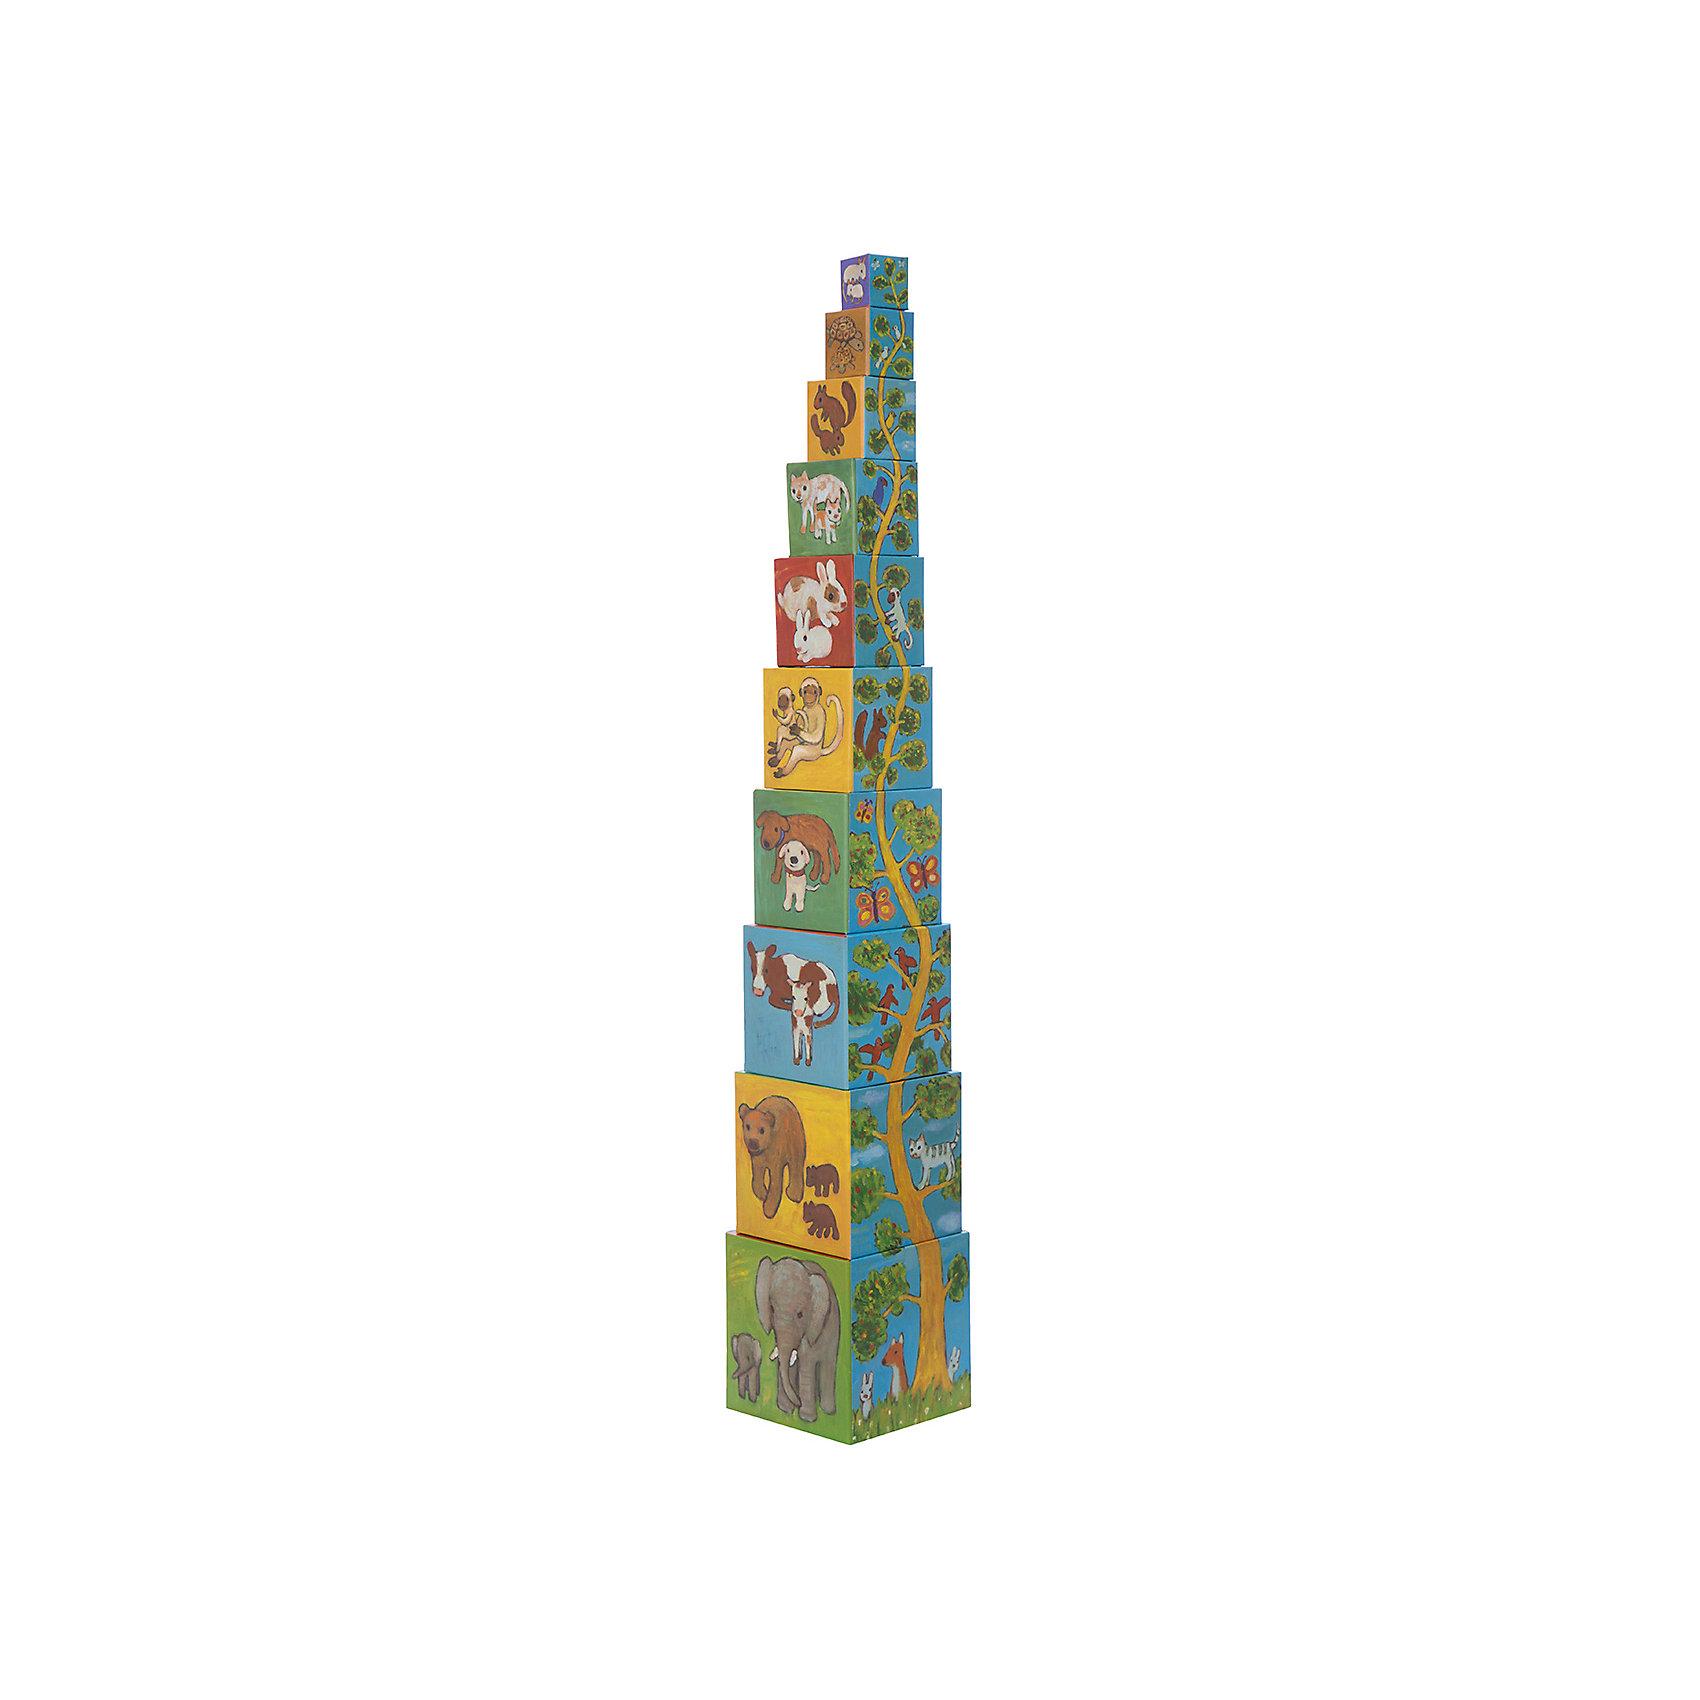 DJECO Кубики-пирамида Мои друзья (10 элементов) от myToys